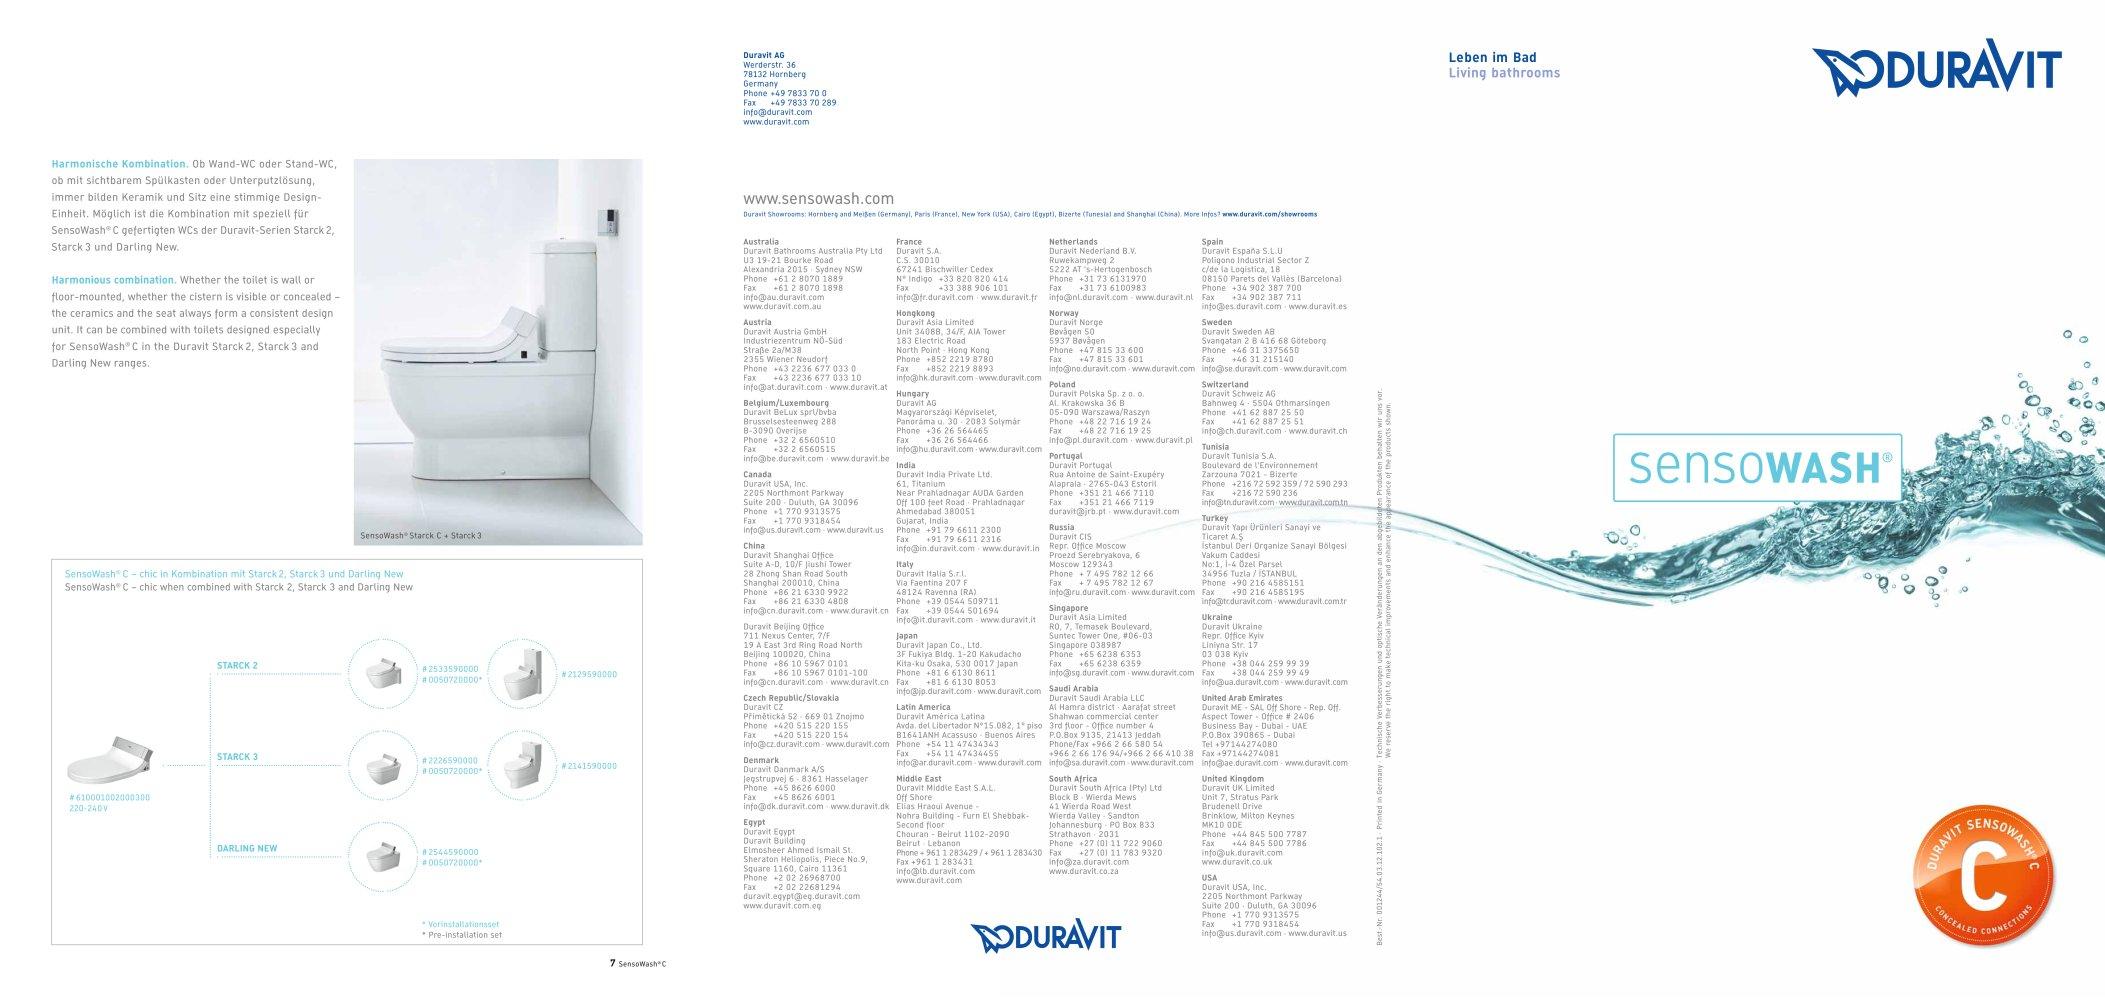 Duravit Sensowash sensowash duravit pdf catalogues documentation brochures